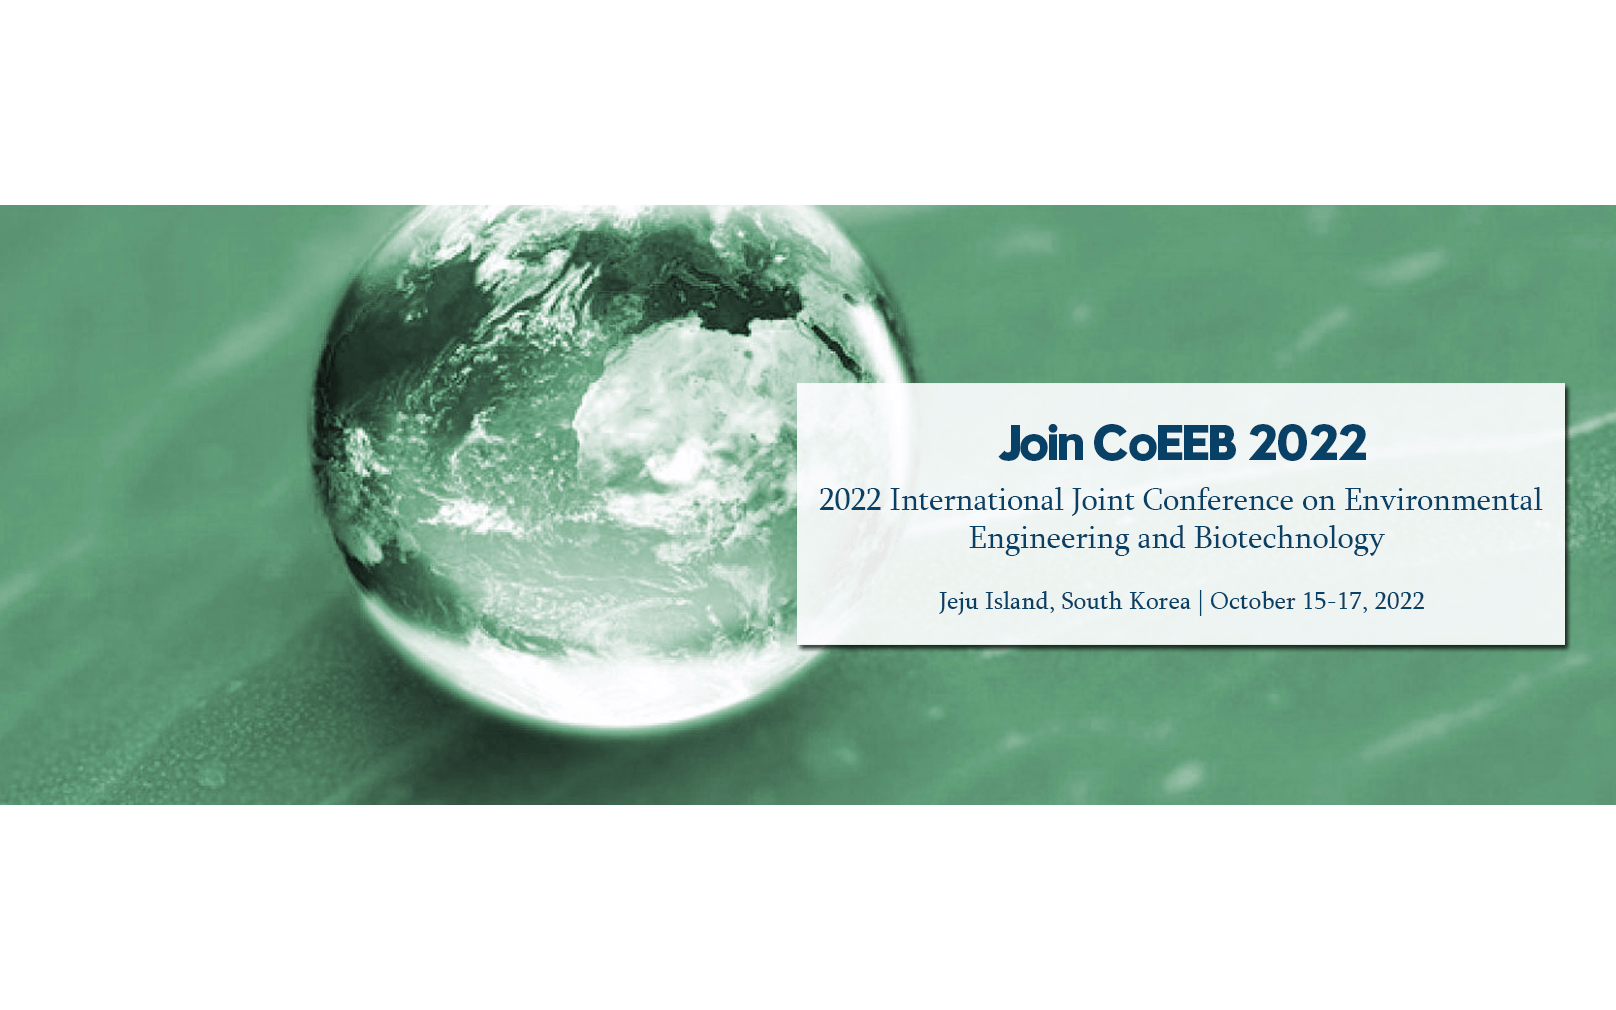 【EI会议】2022年环境工程与生物技术国际会议(CoEEB 2022)